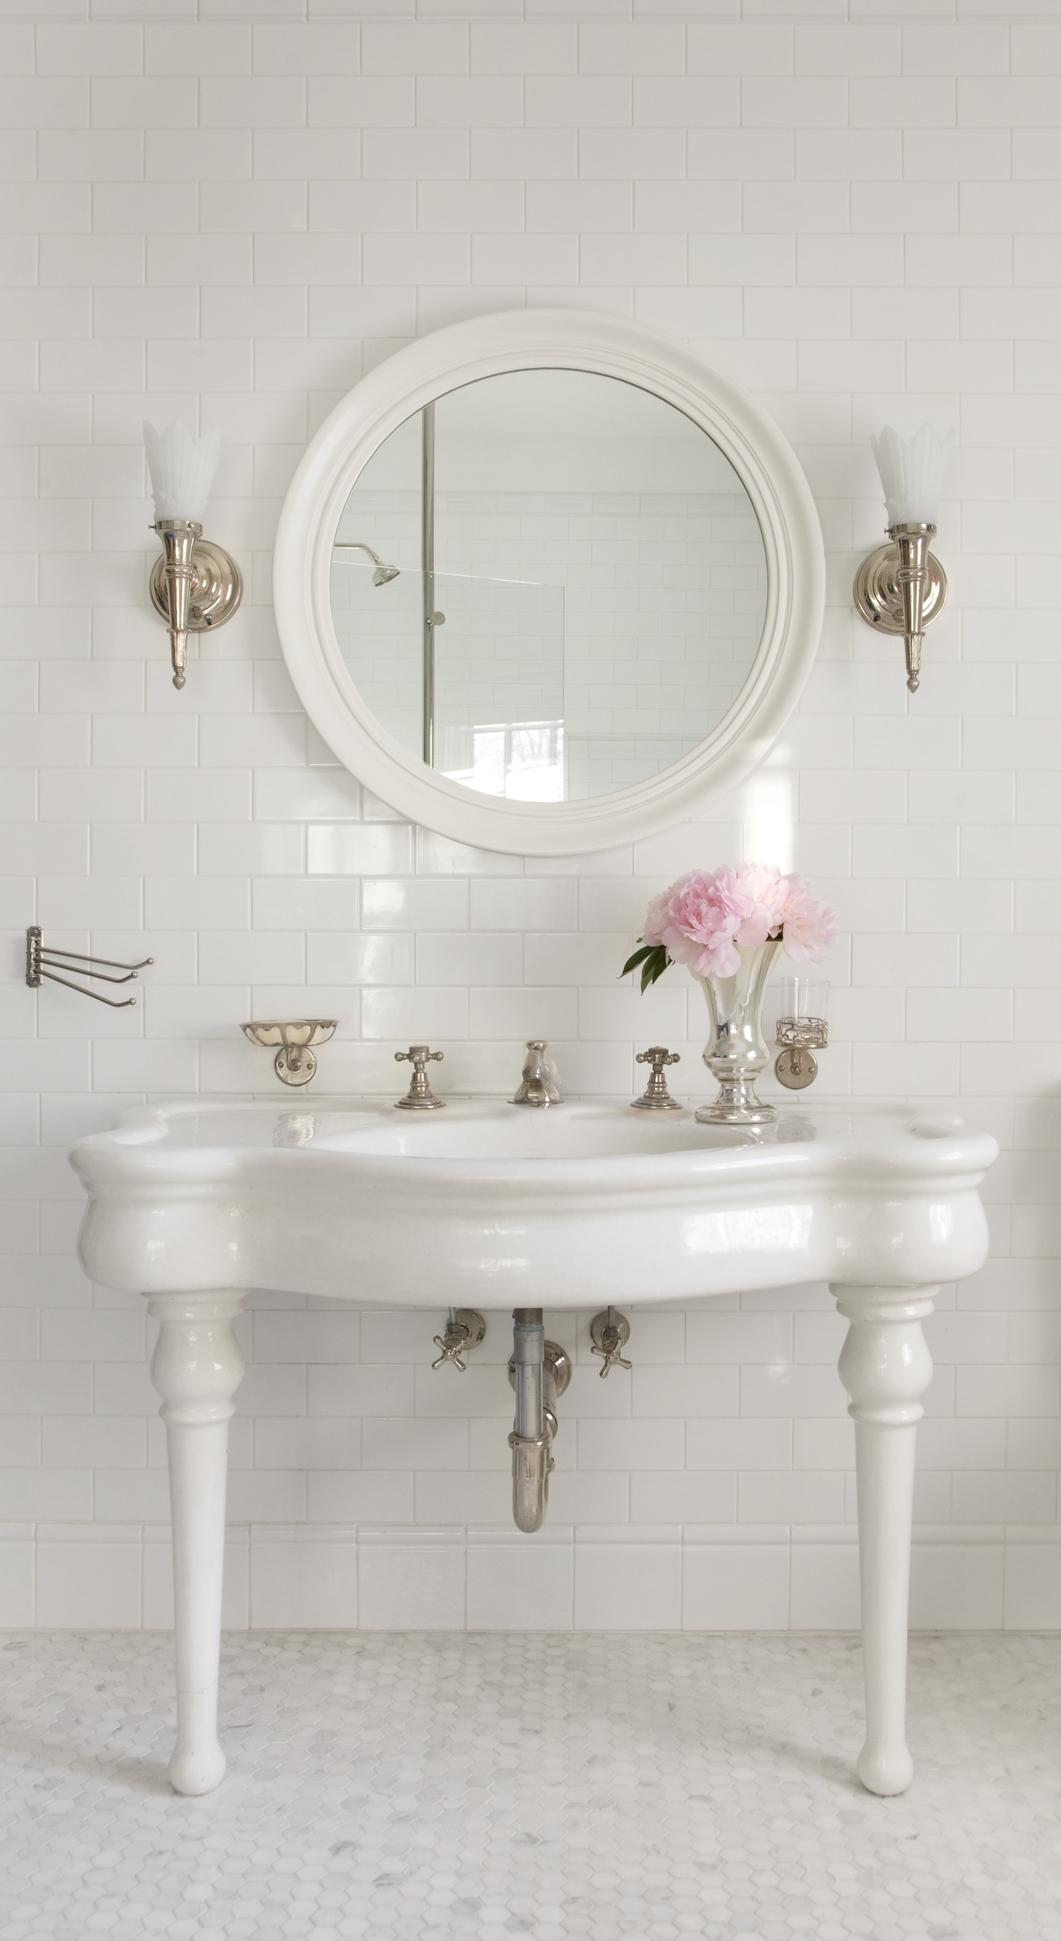 DNE Christine Lane Bathroom Sink Vignette.jpg